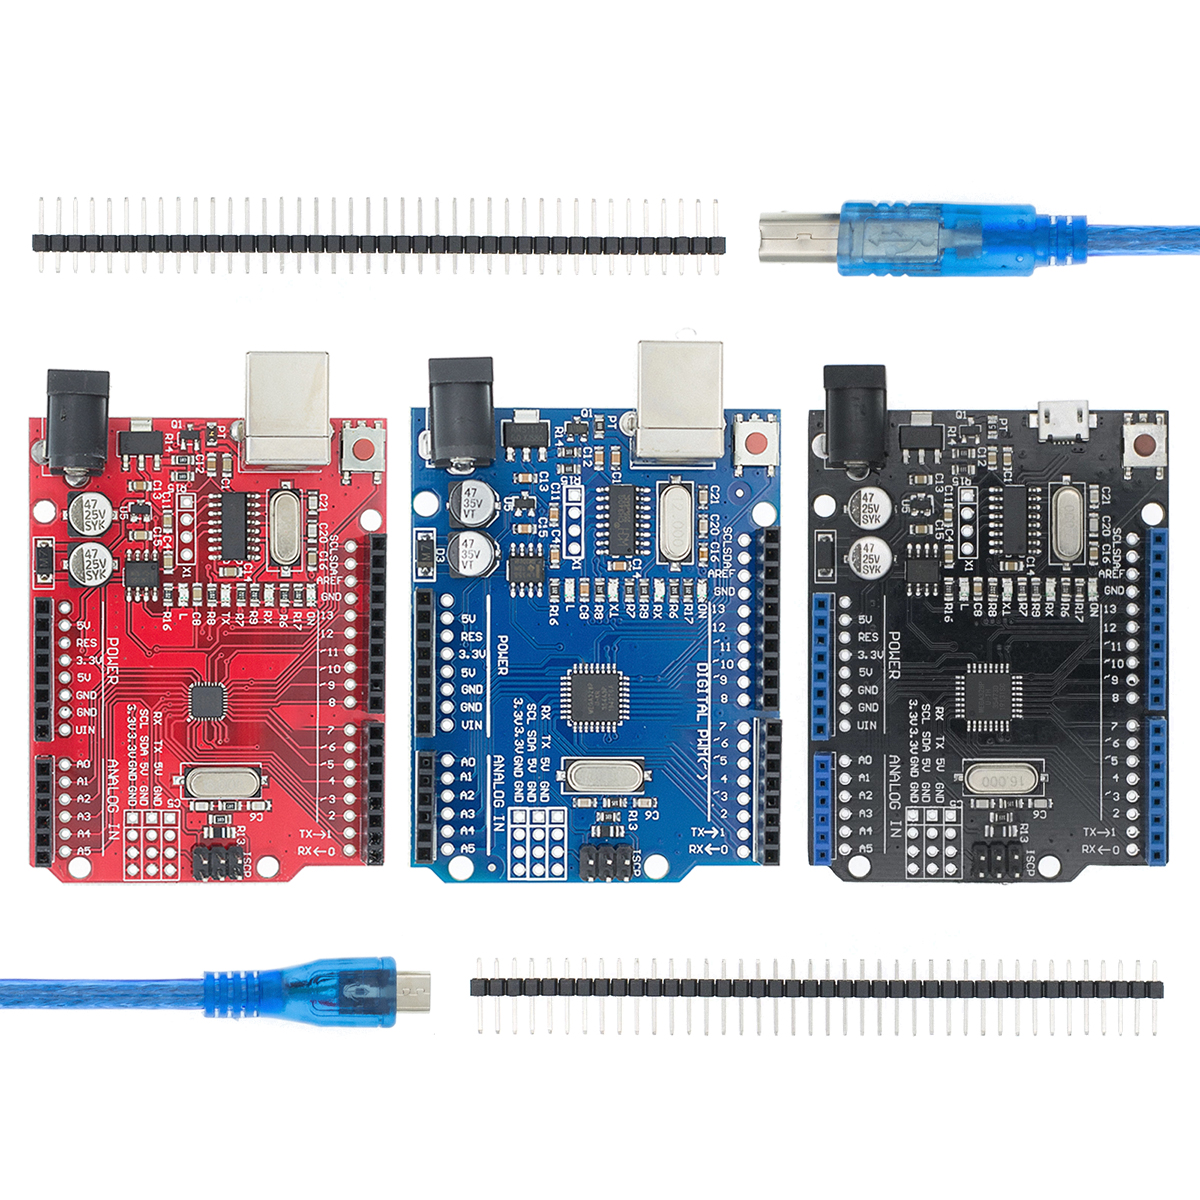 Плата разработки UNO R3 CH340G + MEGA328P SMD чип 16 МГц для Arduino UNO R3, USB-кабель ATMEGA328P CH340 2,4 TFT